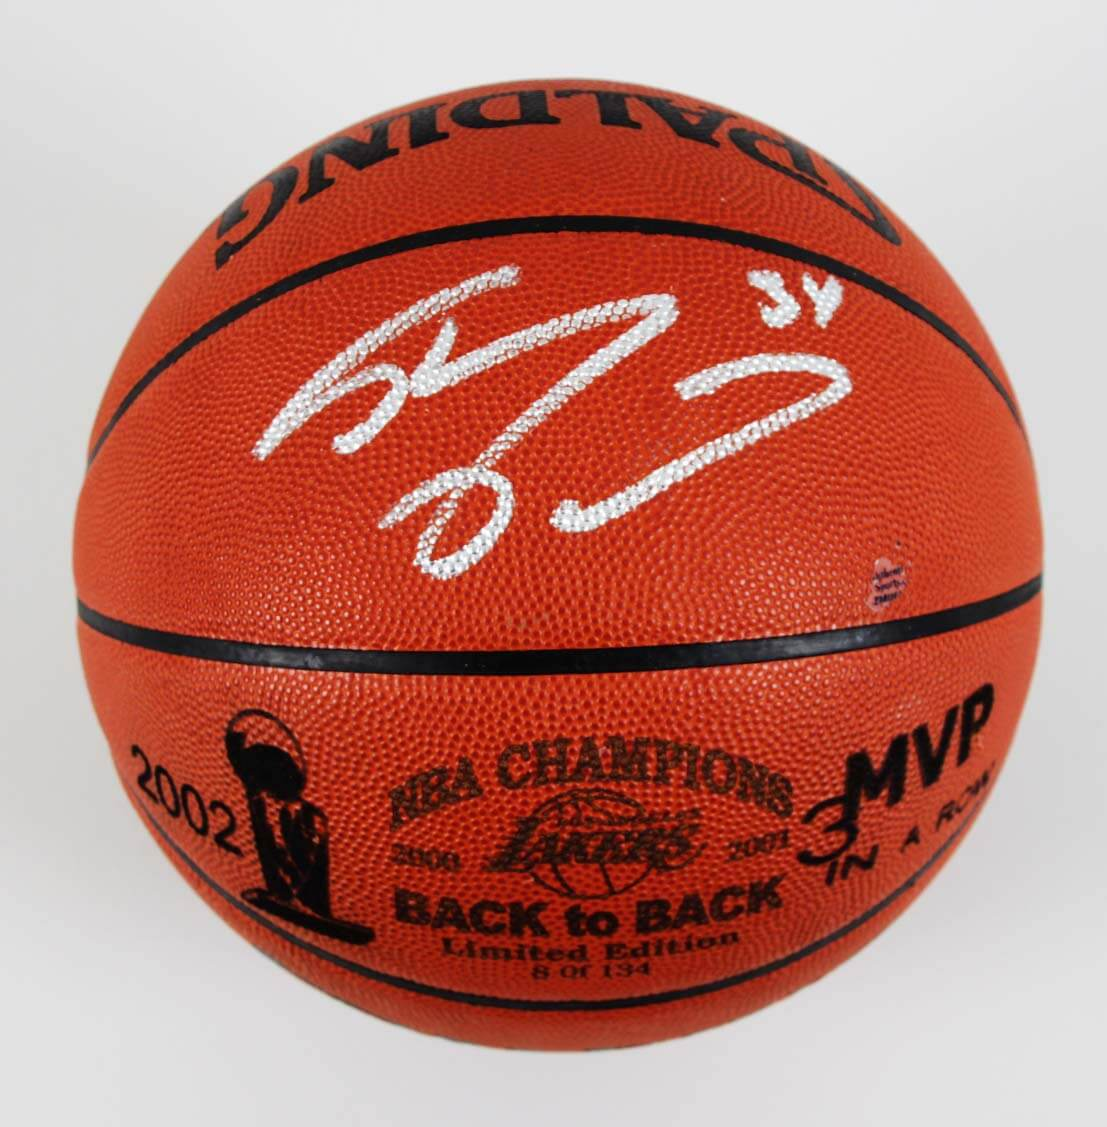 2002 Shaq Signed LE 8/134  Back To Back Lakers Official Stern Basketball - COA JSA